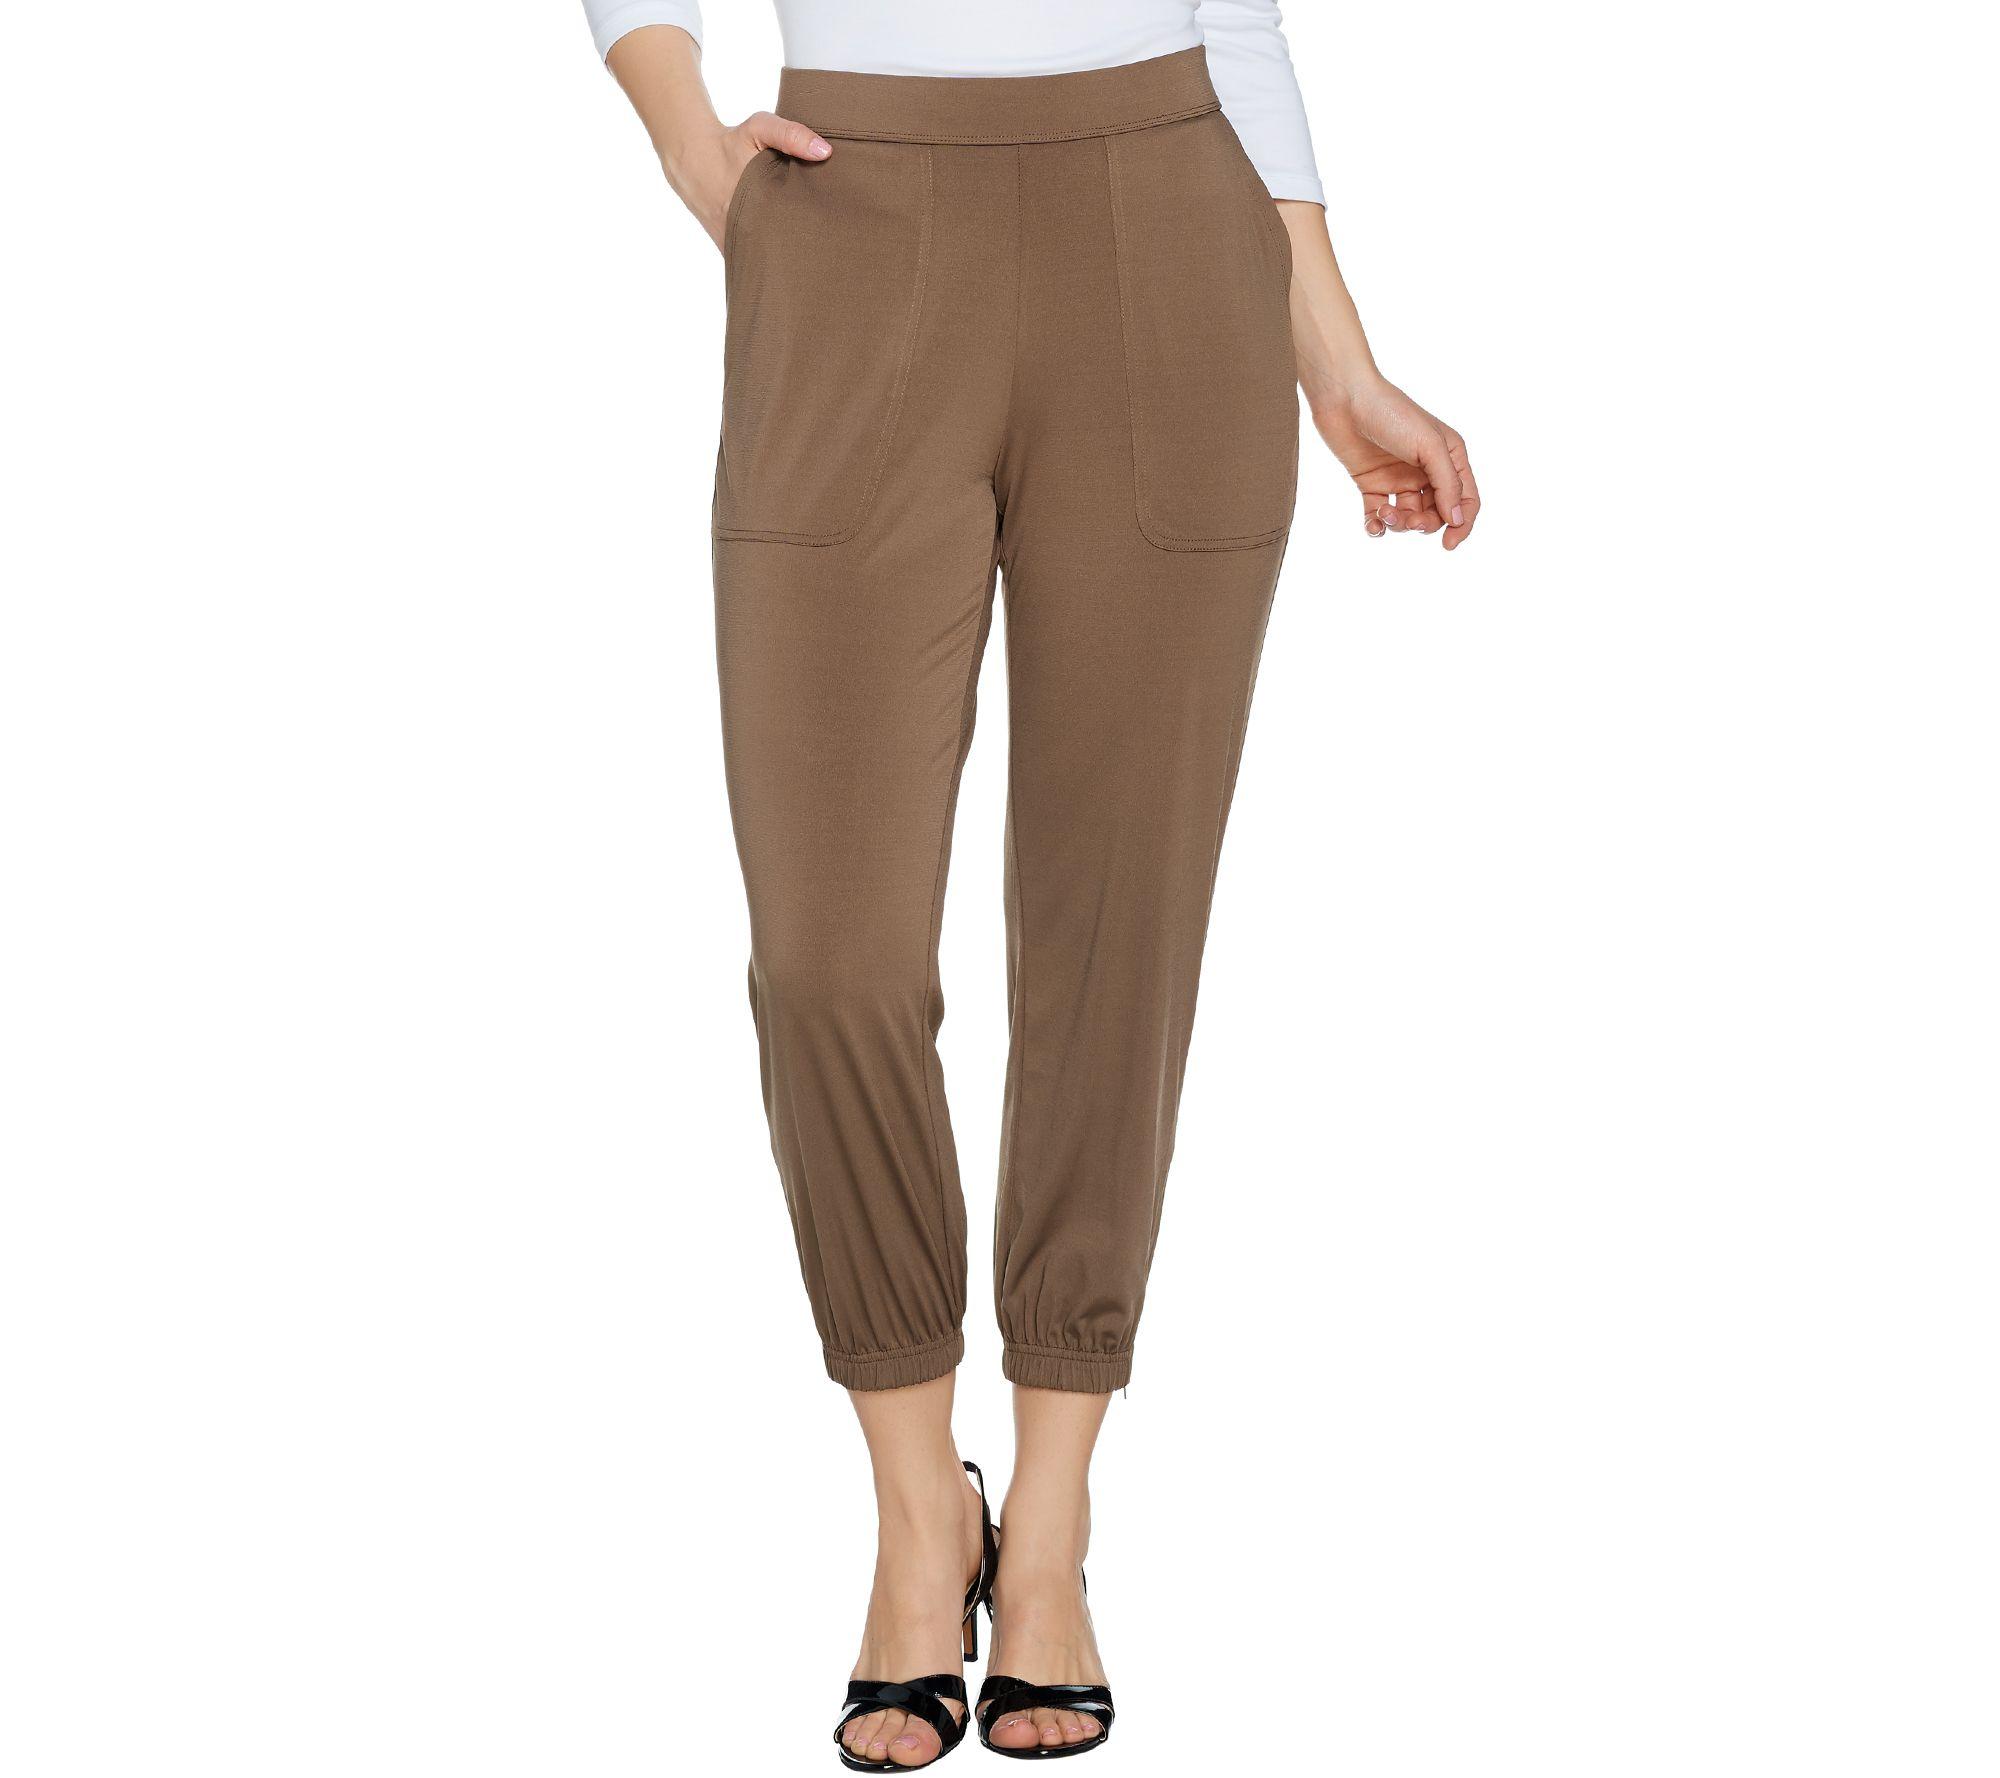 New Customer Qvc Promo Code - Lisa rinna collection regular banded bottom knit crop pants a287831